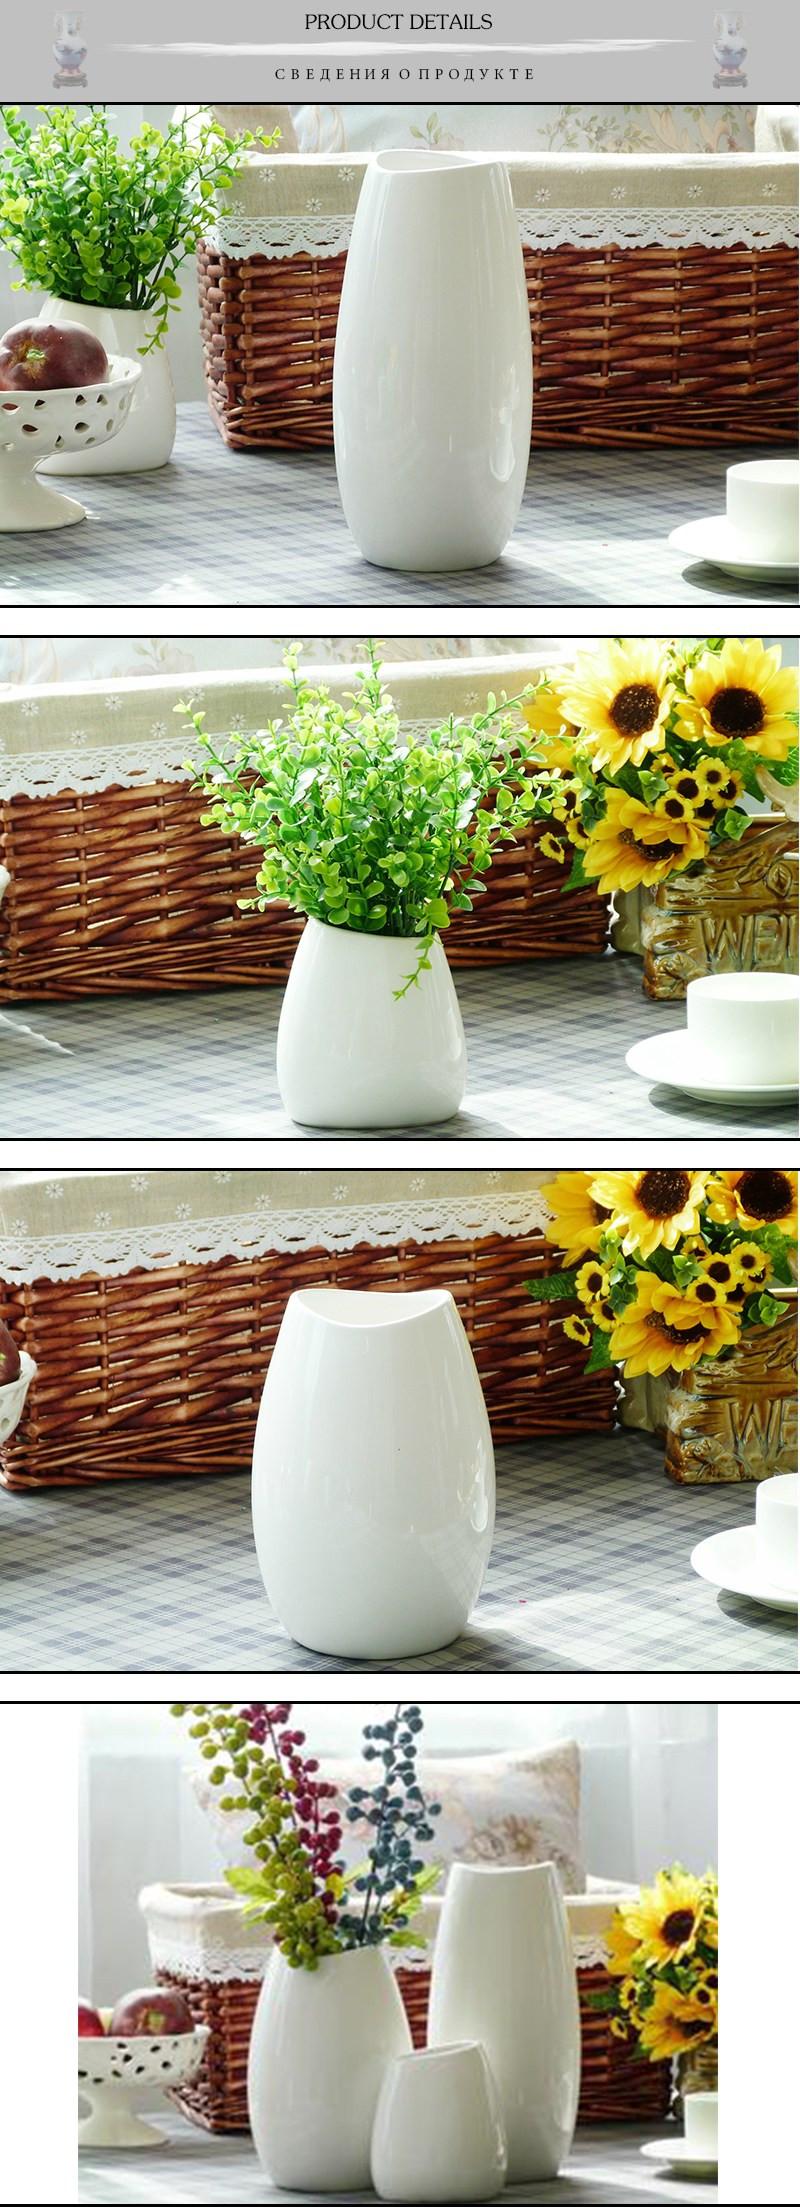 blue and white striped vase of a‰§classic crafts white porcelain vase modern desktop small vase pertaining to classic crafts white porcelain vase modern desktop small vase creative home decoration gifts ulknn